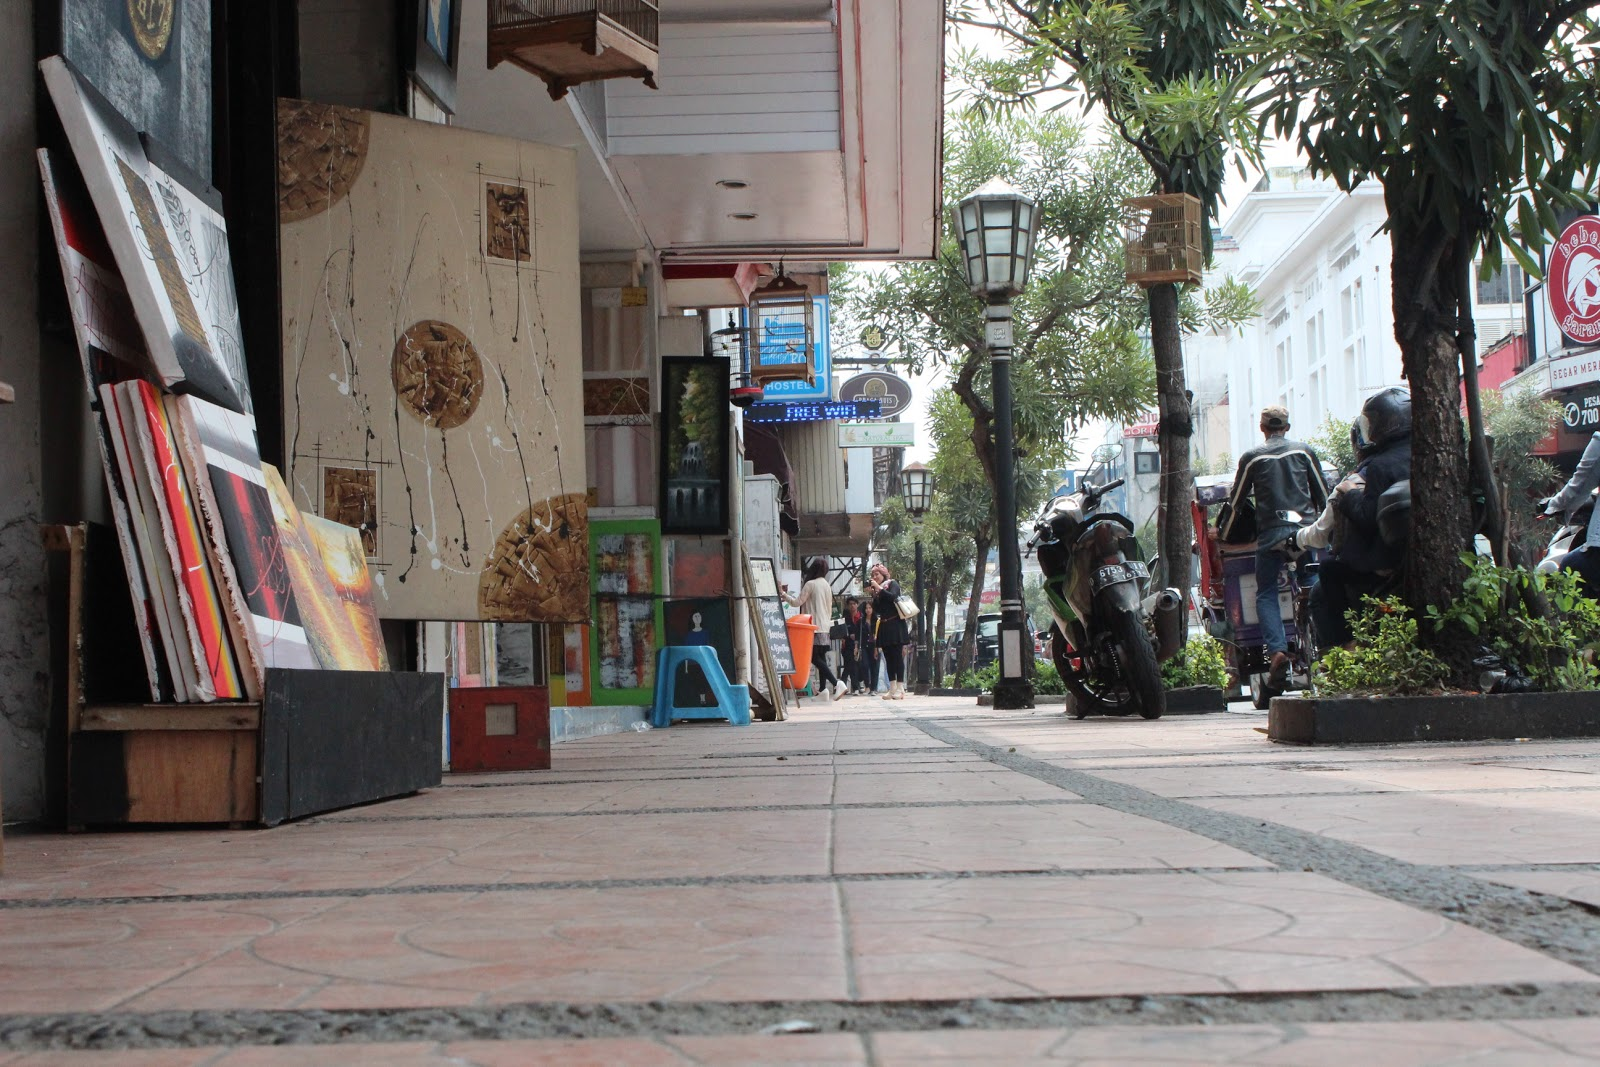 Nuansa Eropa Jalan Braga Belajar Nulis Feature Suasana Kab Bandung